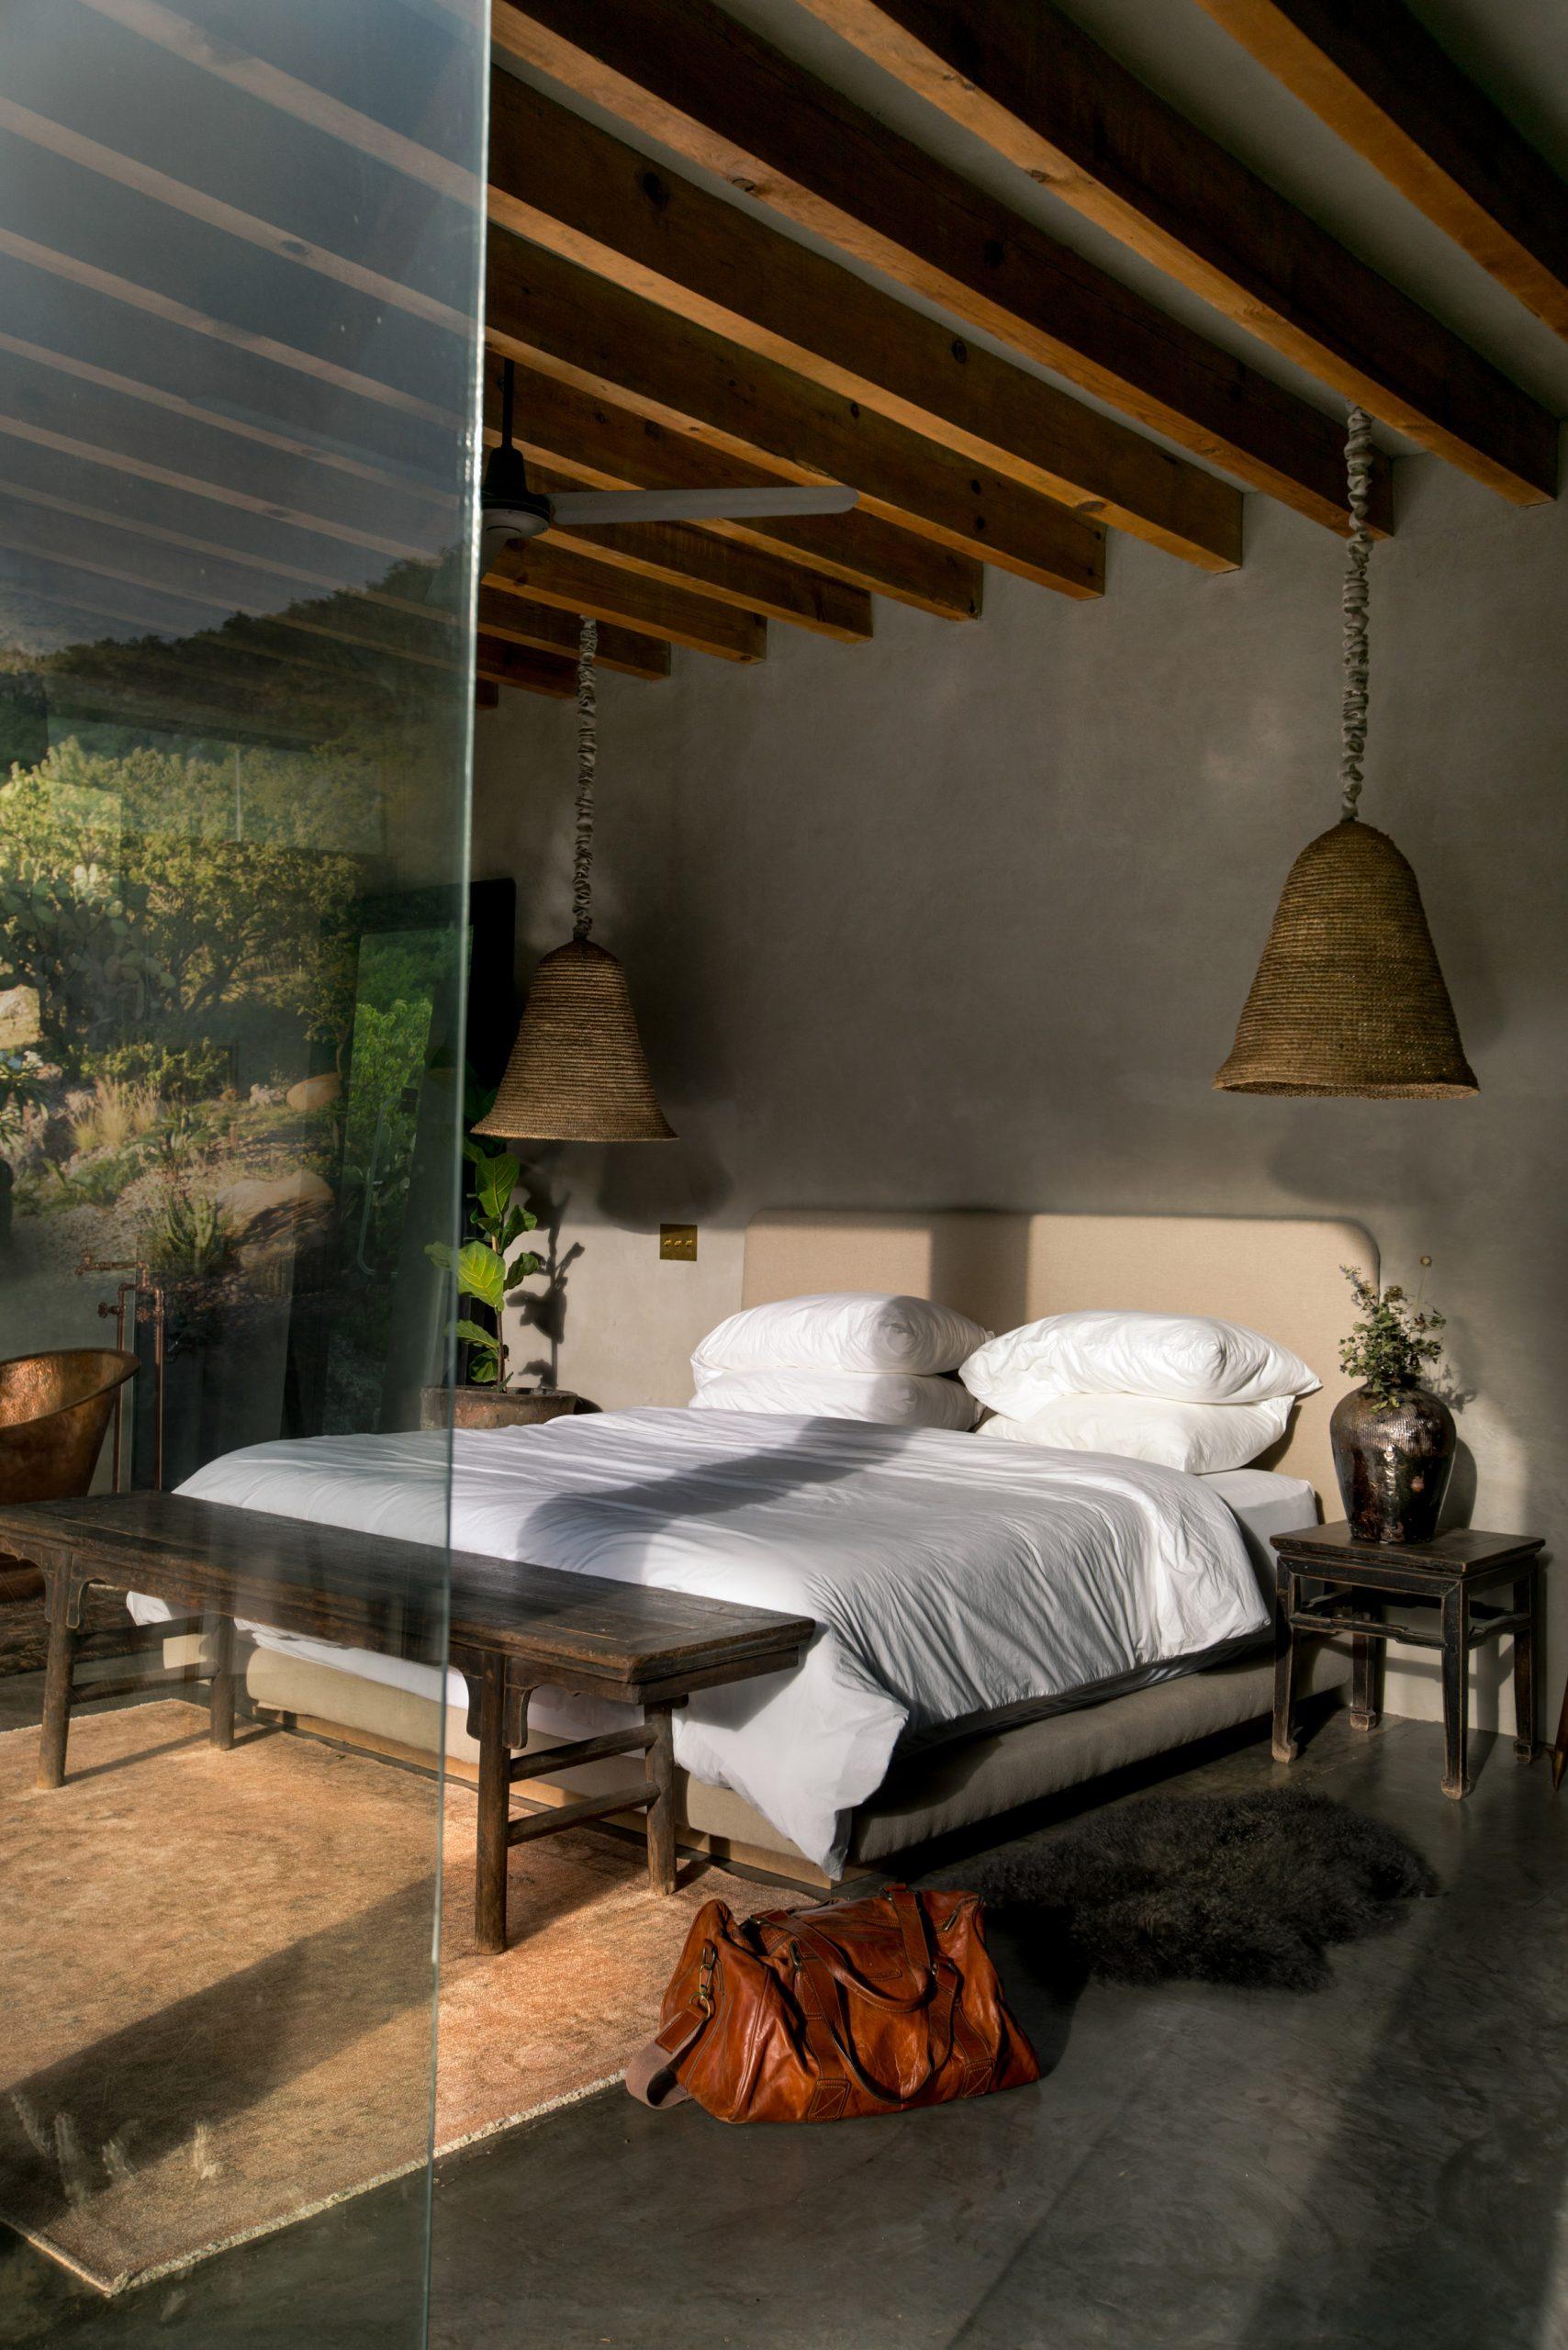 Bedroom of mirrored cabin by Prashant Ashoka